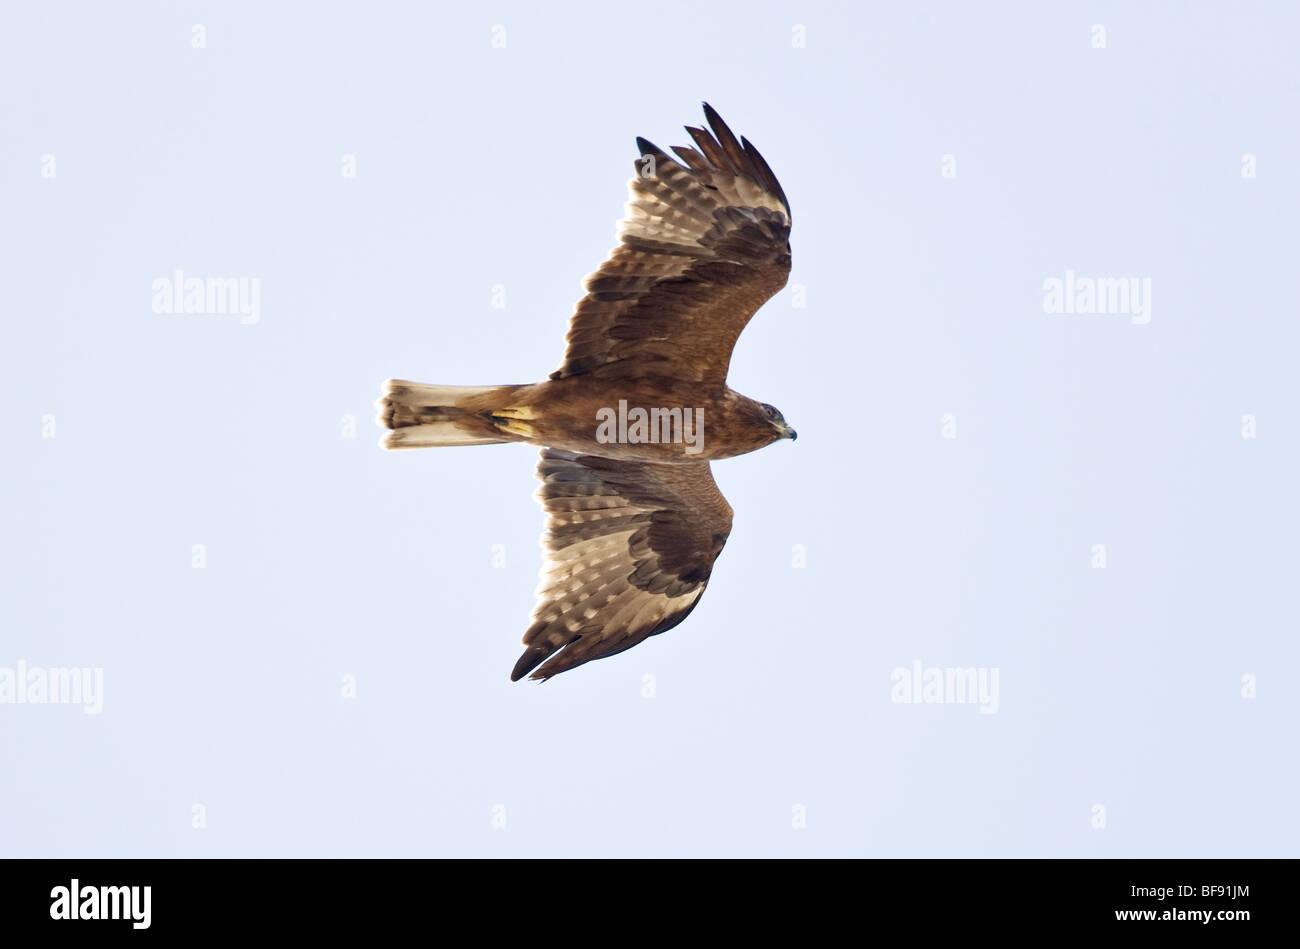 Booted Eagle Hieraaelus penates on Autumn migration over tarifa to africa - Stock Image